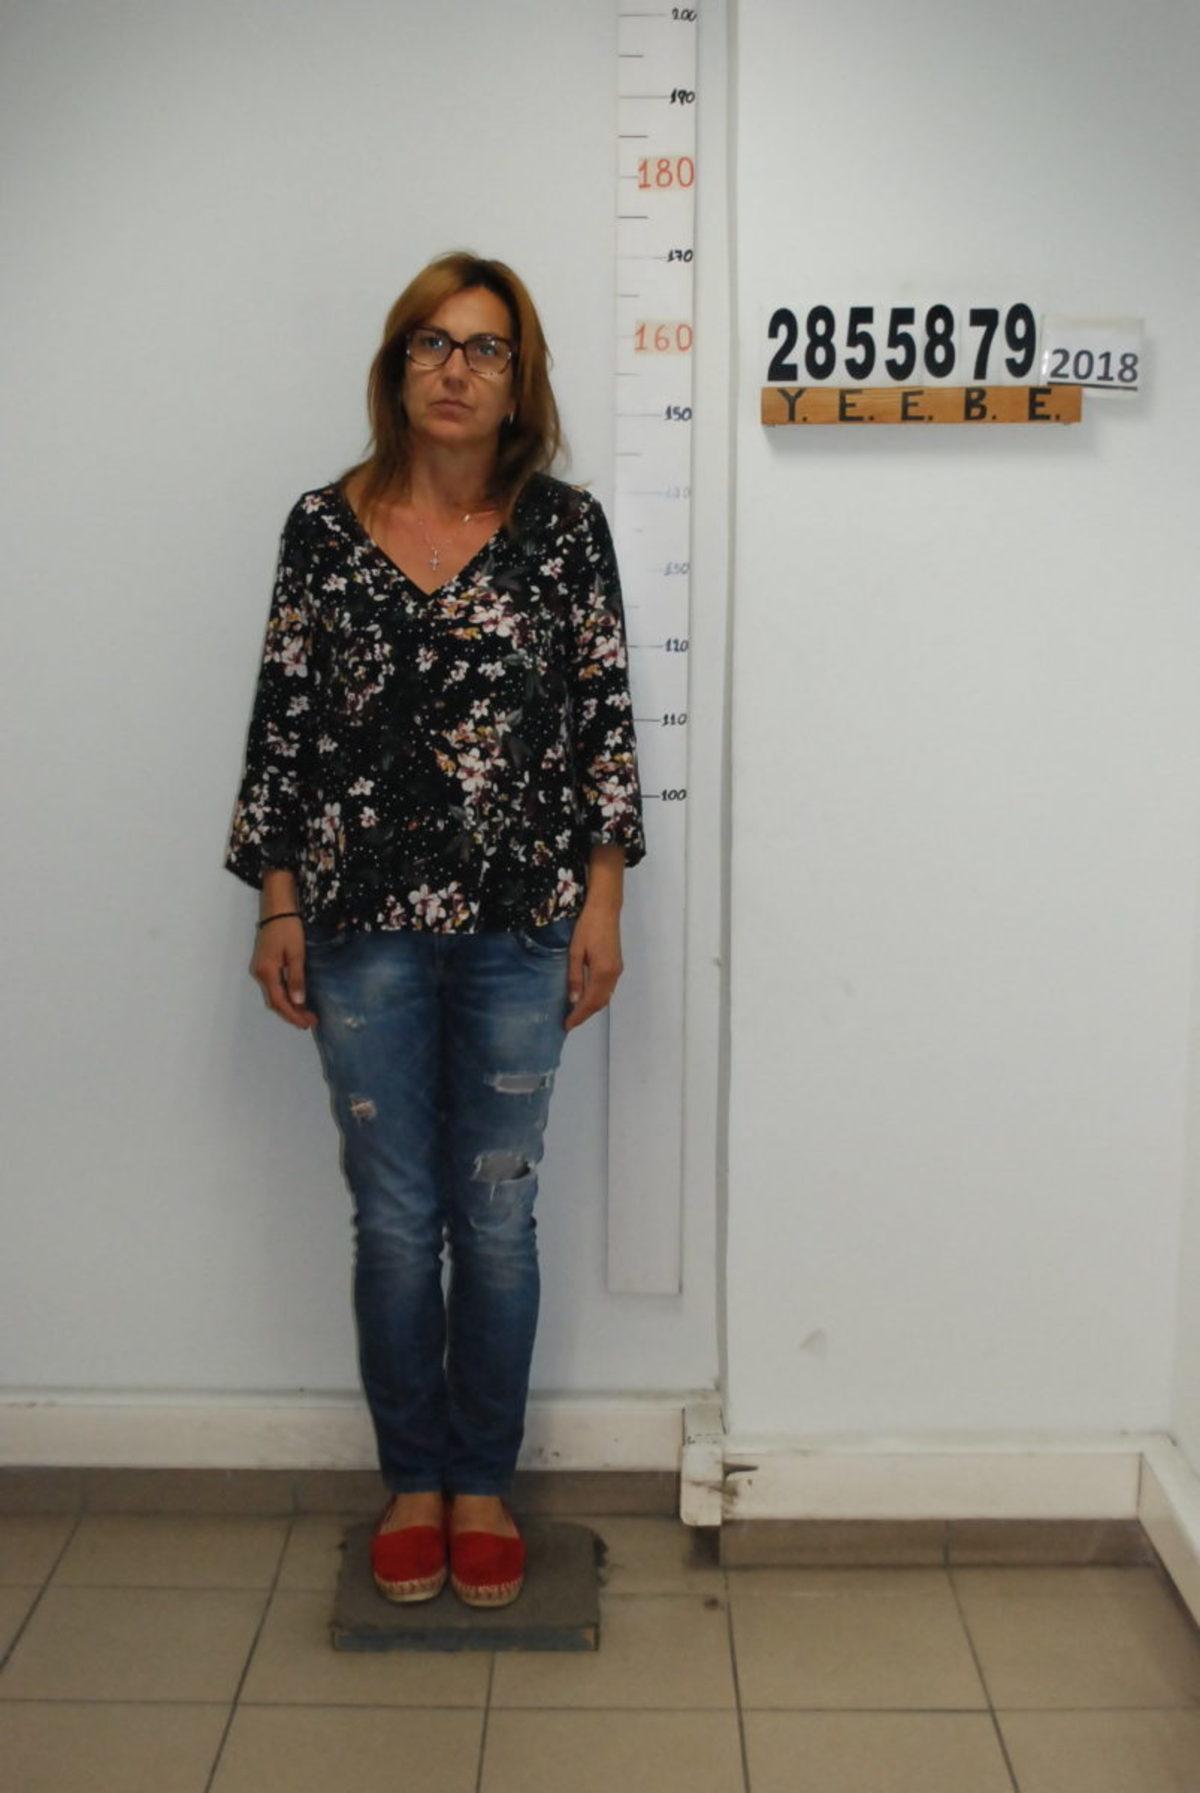 se7 - Αυτός είναι ο καθηγητής «Φακελάκης» στις Σέρρες – Φωτογραφίες και των φερόμενων ως συνεργών του